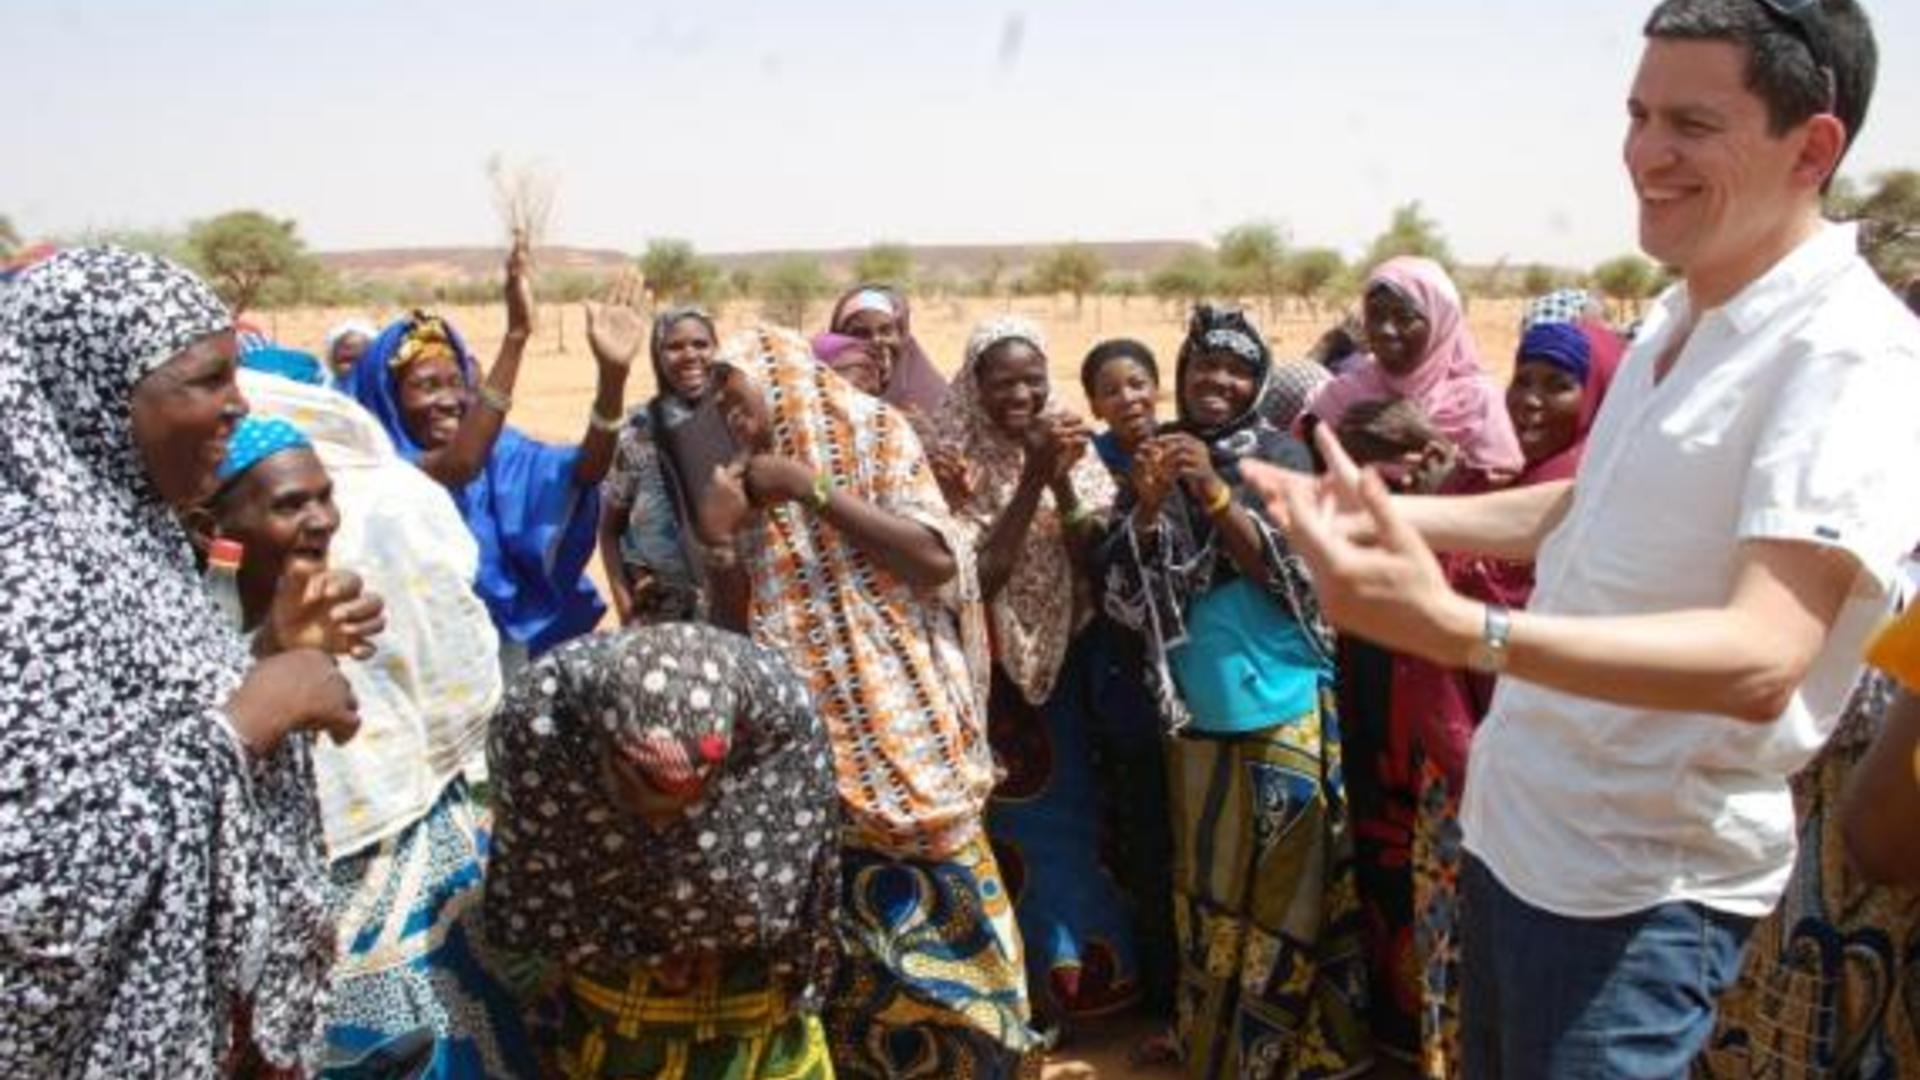 African nations struggle for independence | International